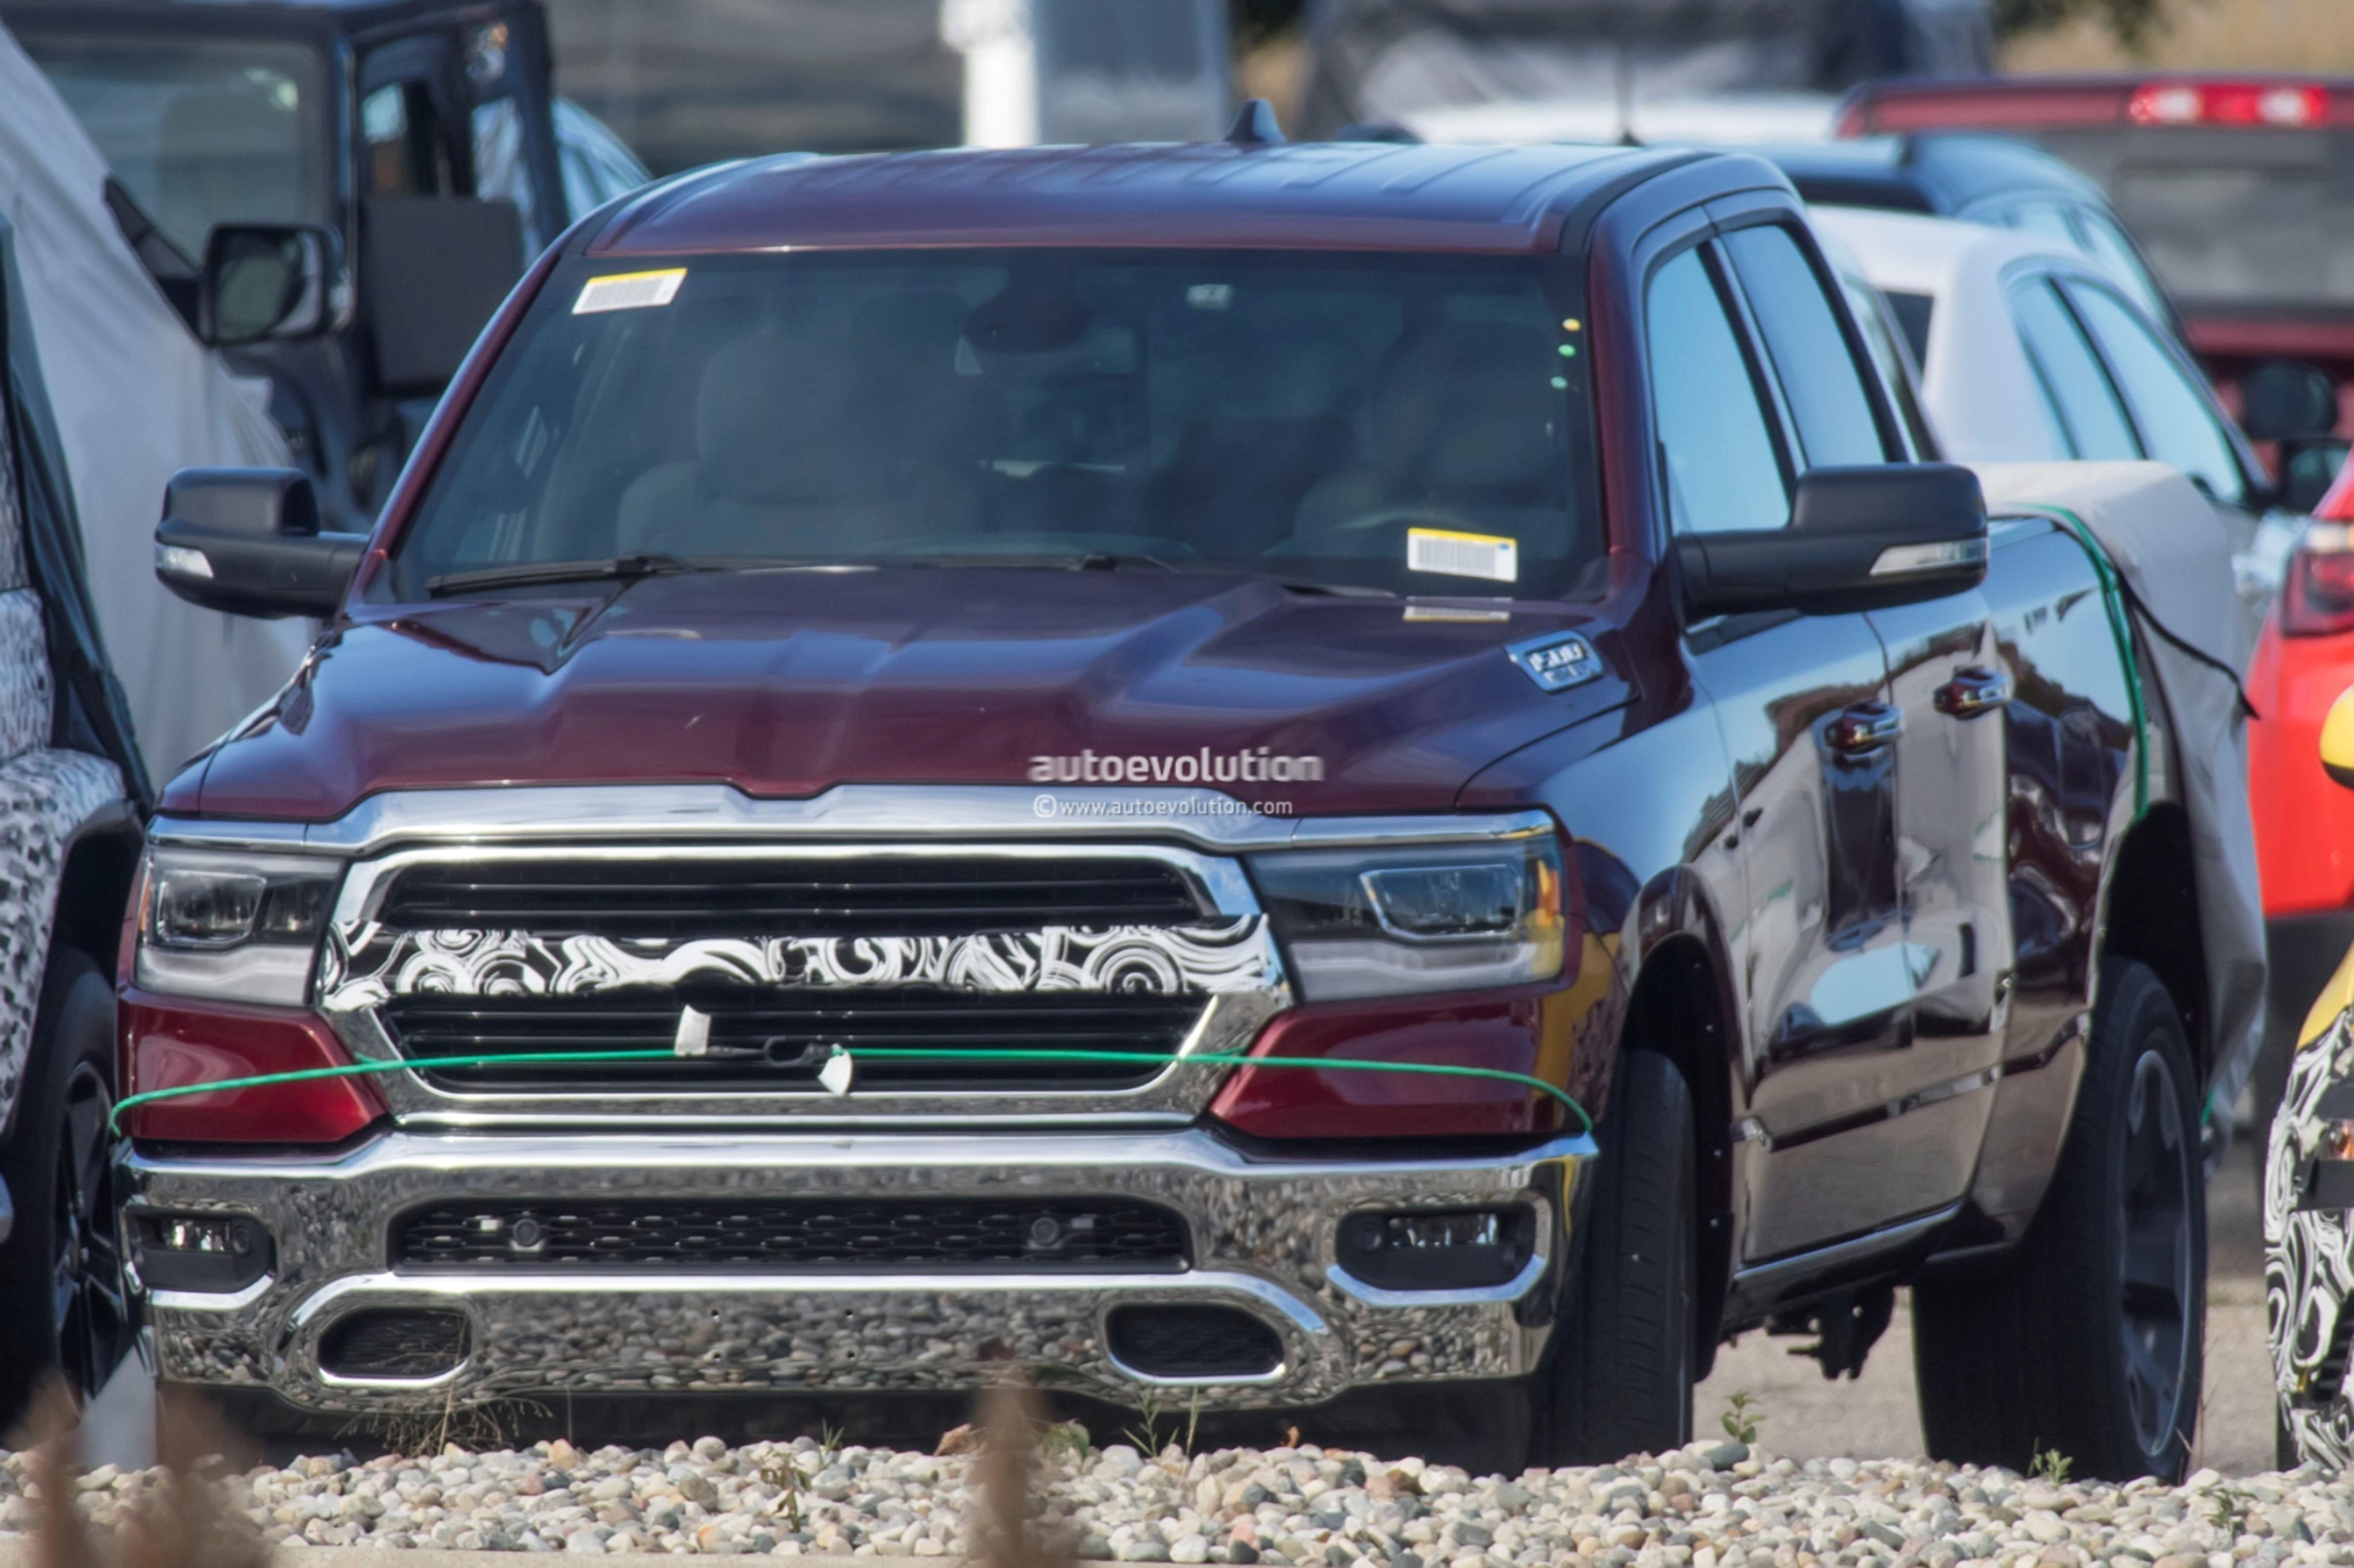 Spyshots: Undisguised 2019 Ram 1500 Boasts 5.7L HEMI V8 ...